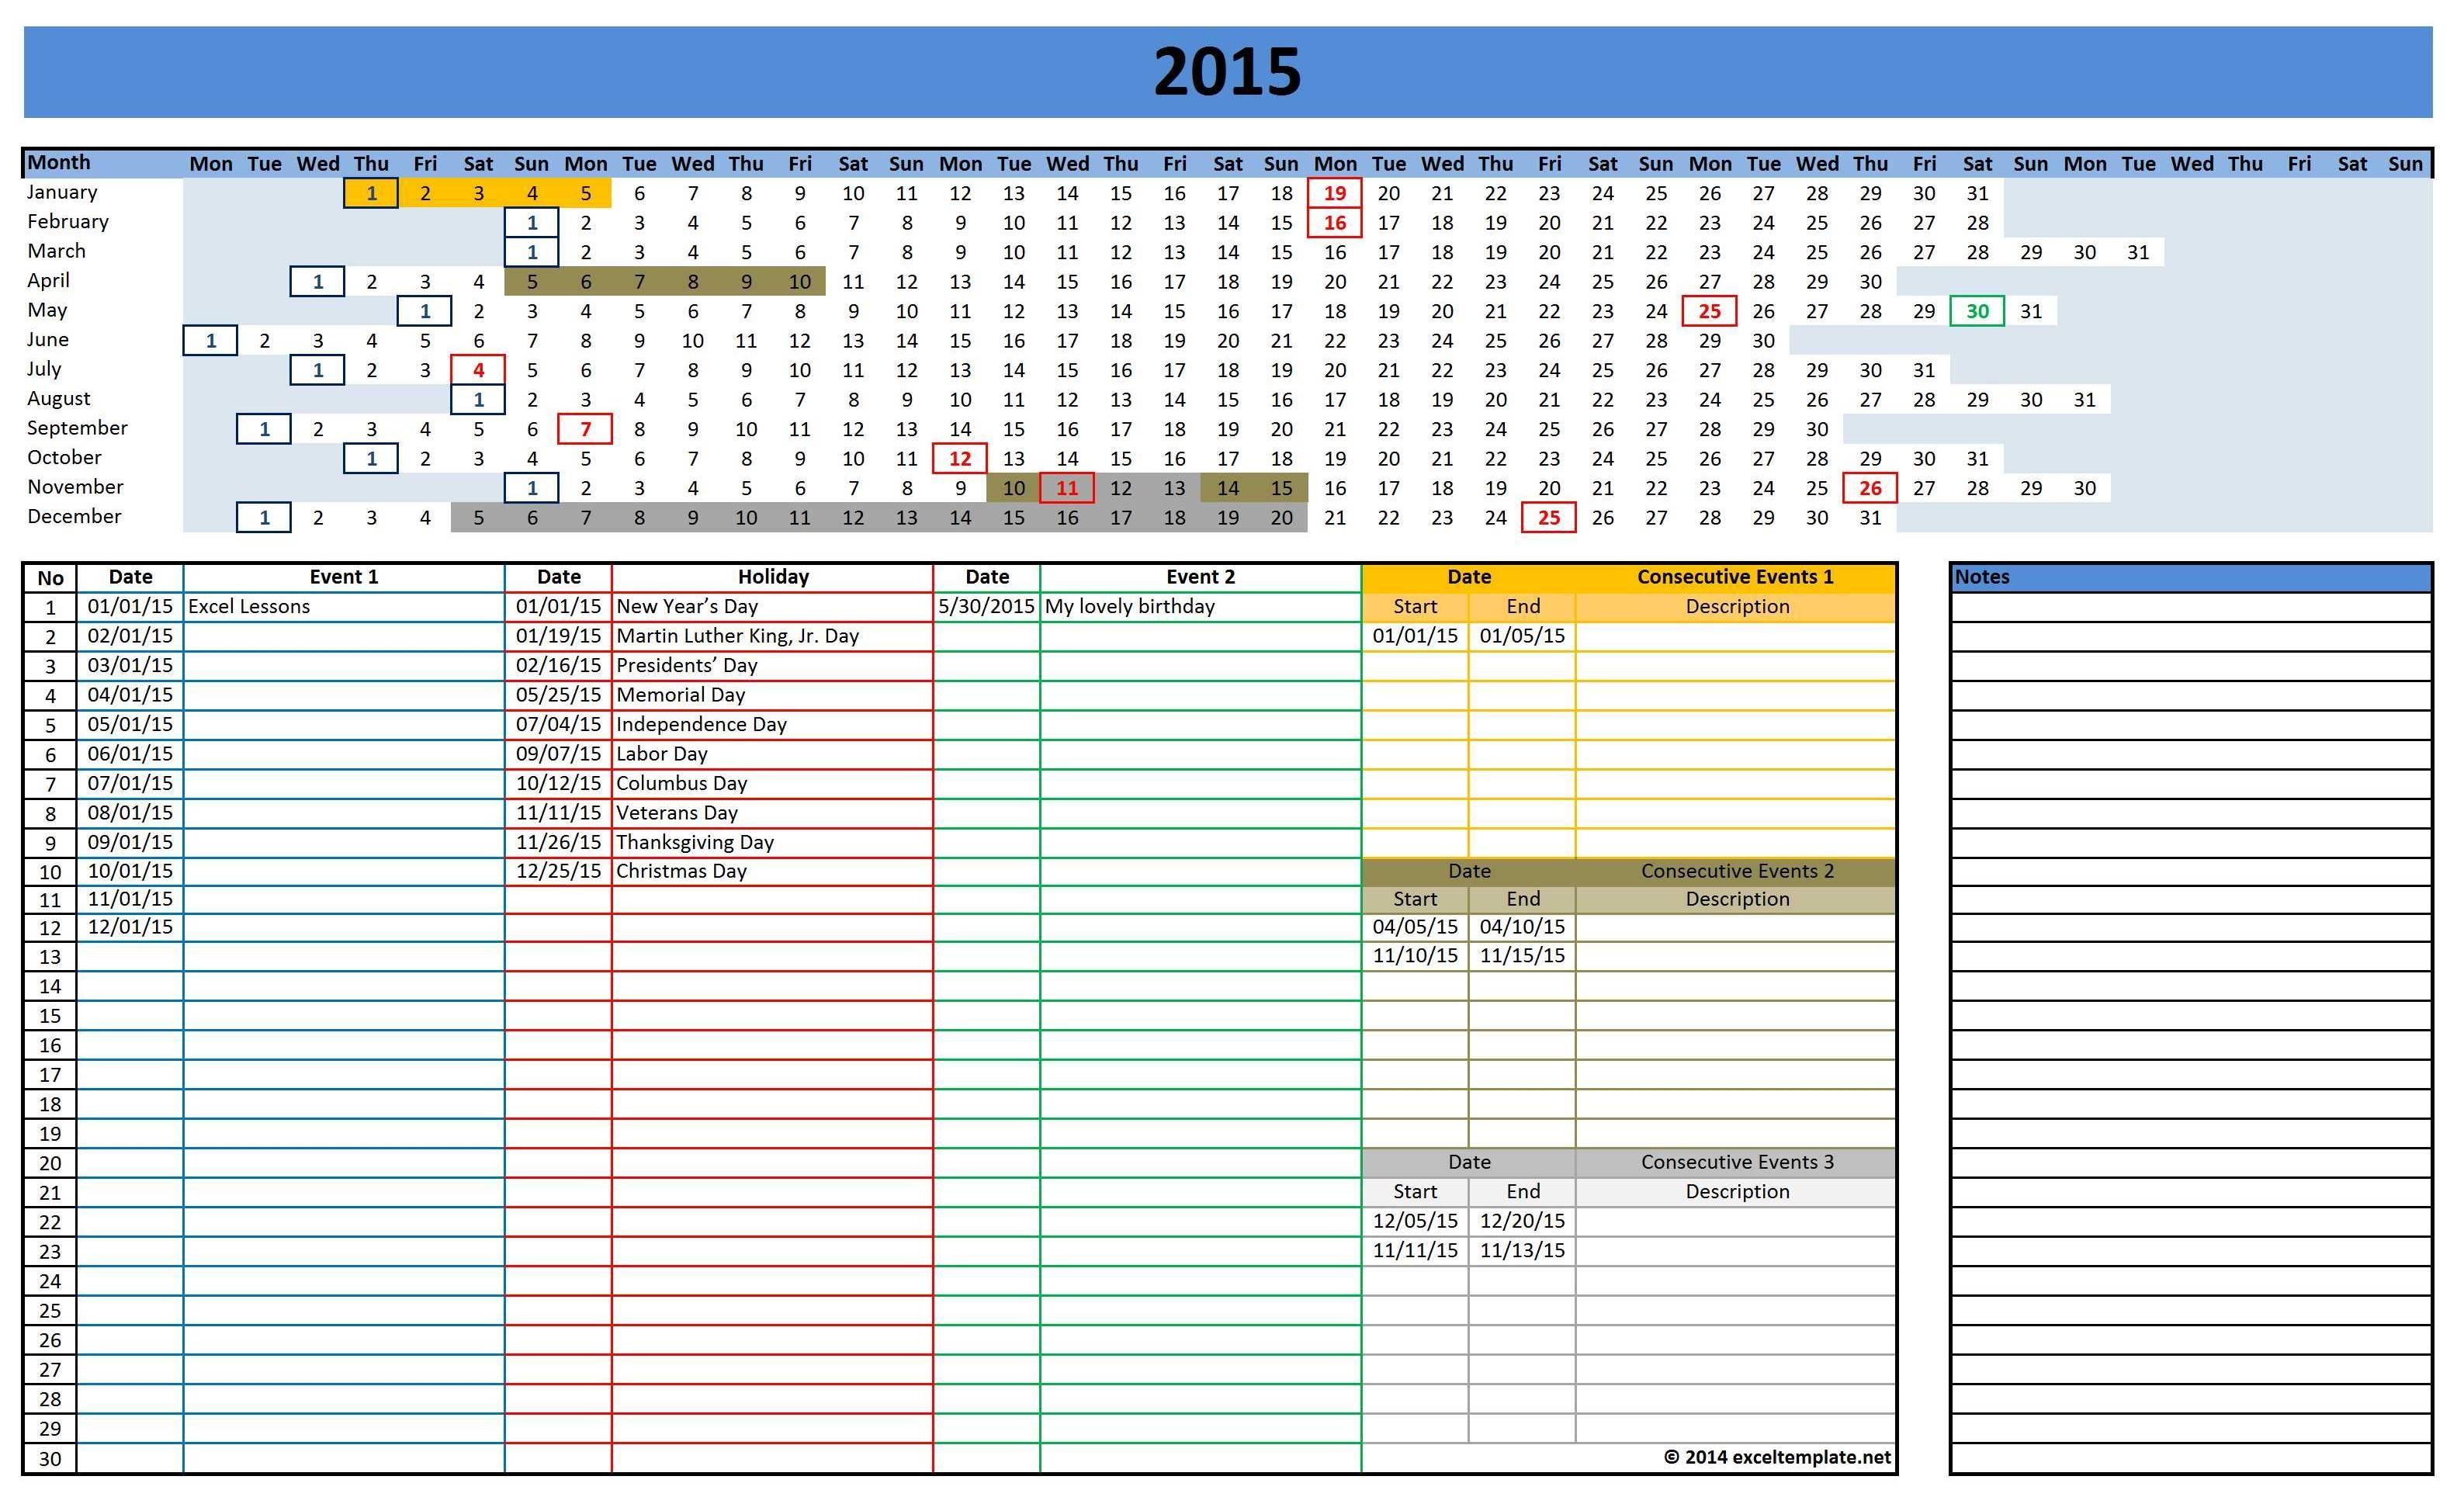 Microsoft Excel Calendar Templates 2015 Fieldstationco3abry